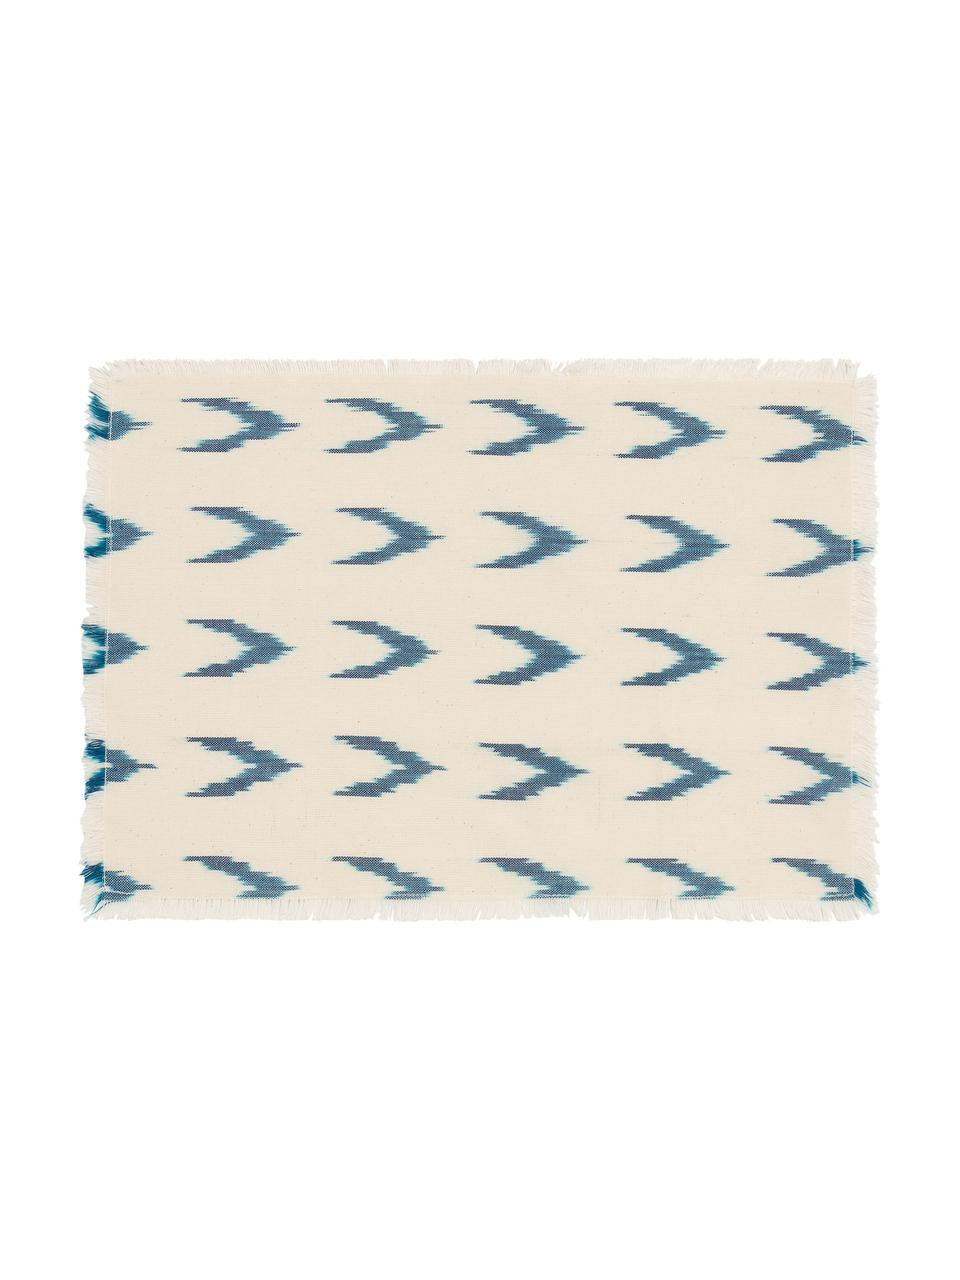 Set de table en tissu, bohème Cala, Bleu, blanc